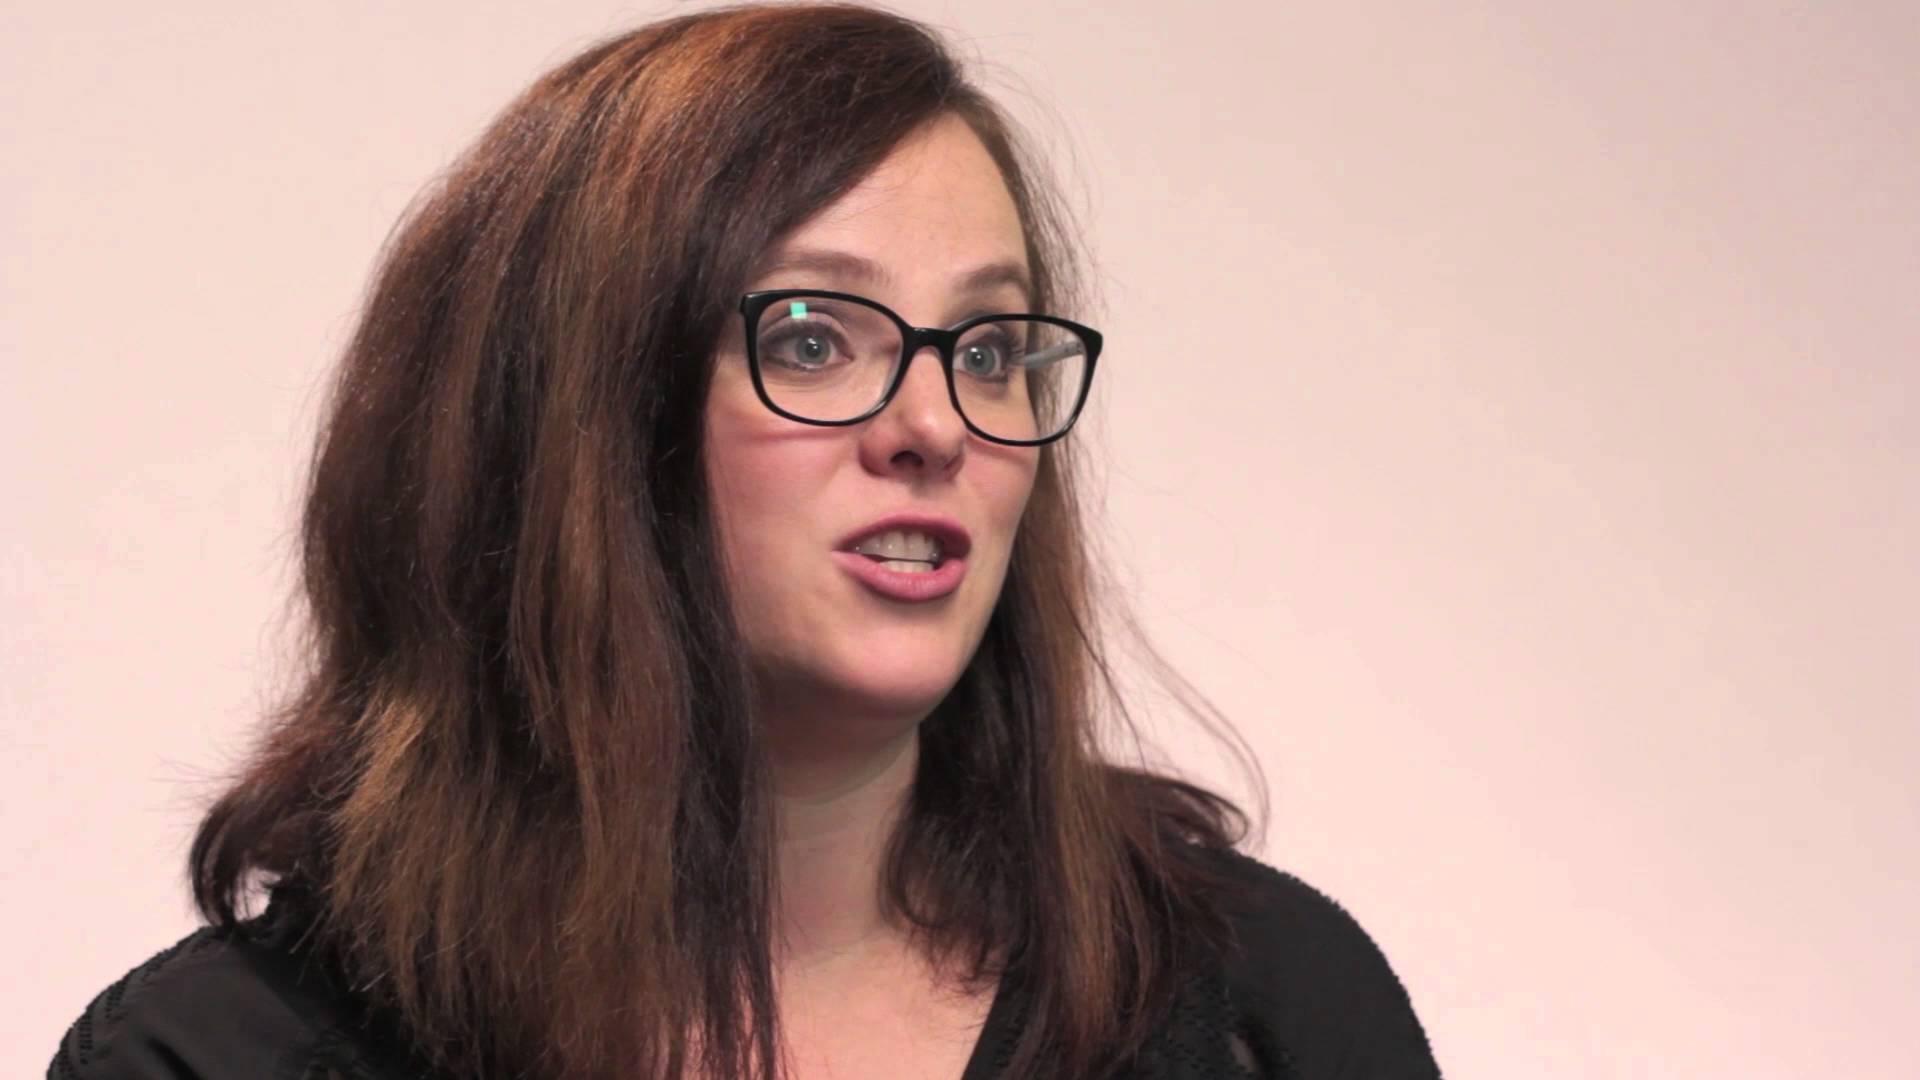 Sarah Bessey: Finally someone seeks to bridge the gap between Christianity and Feminism